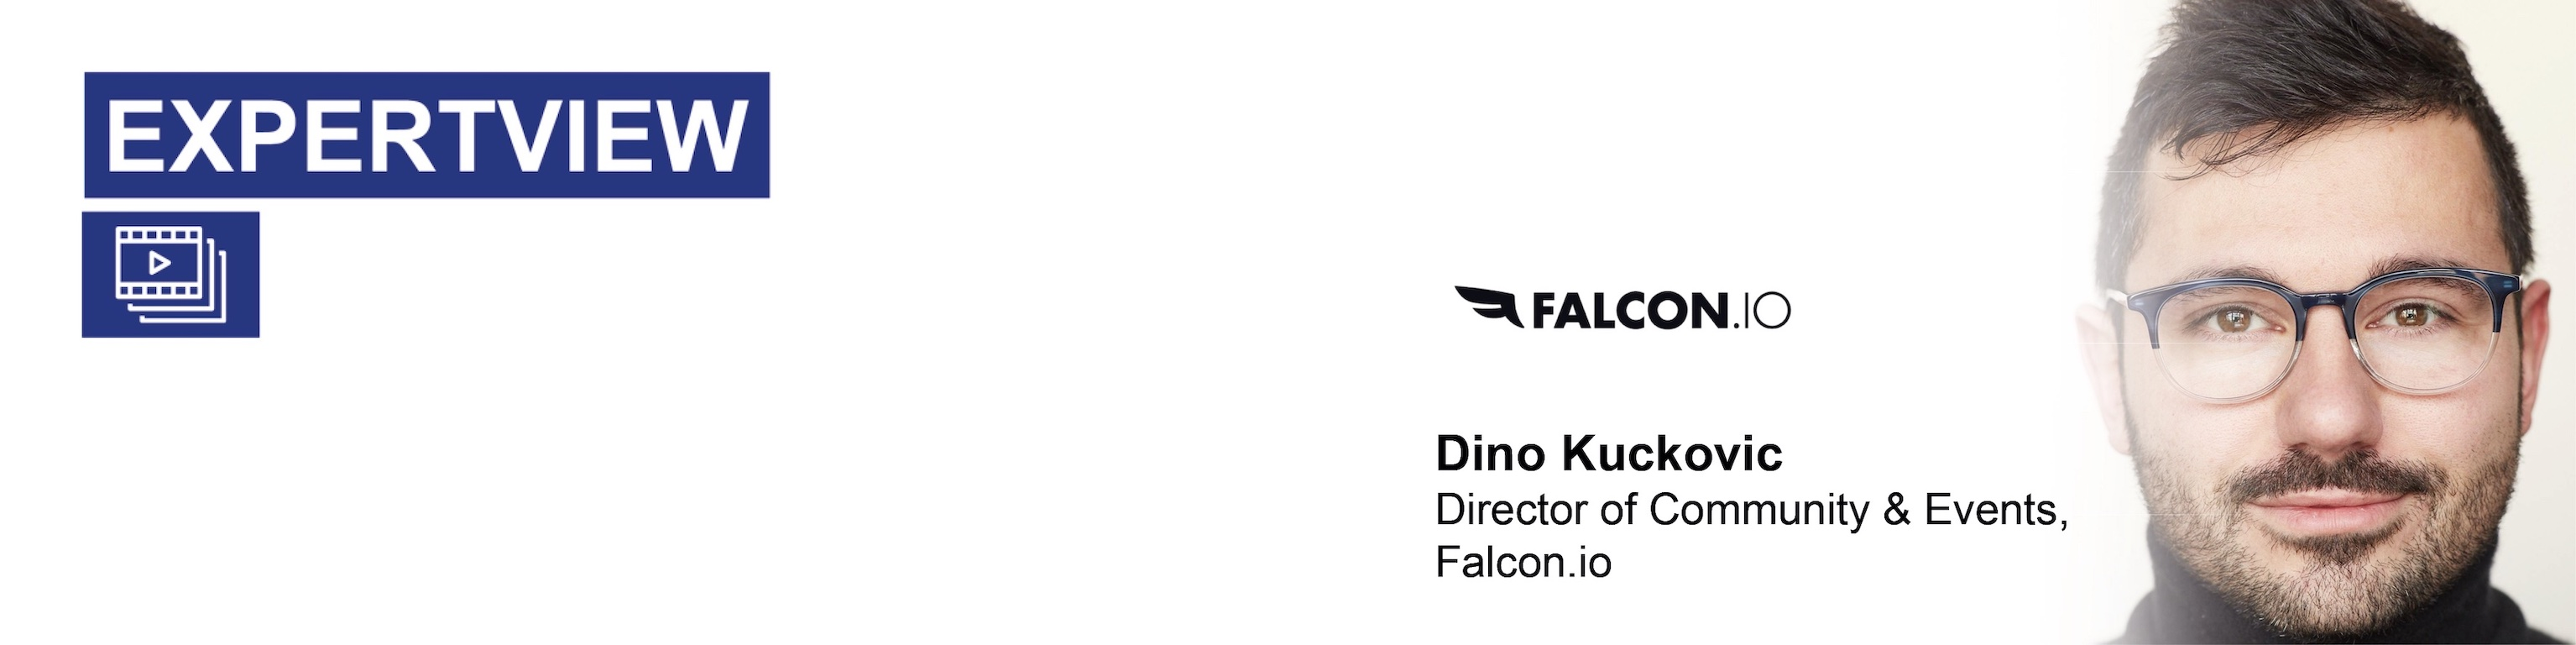 header_falcon.io